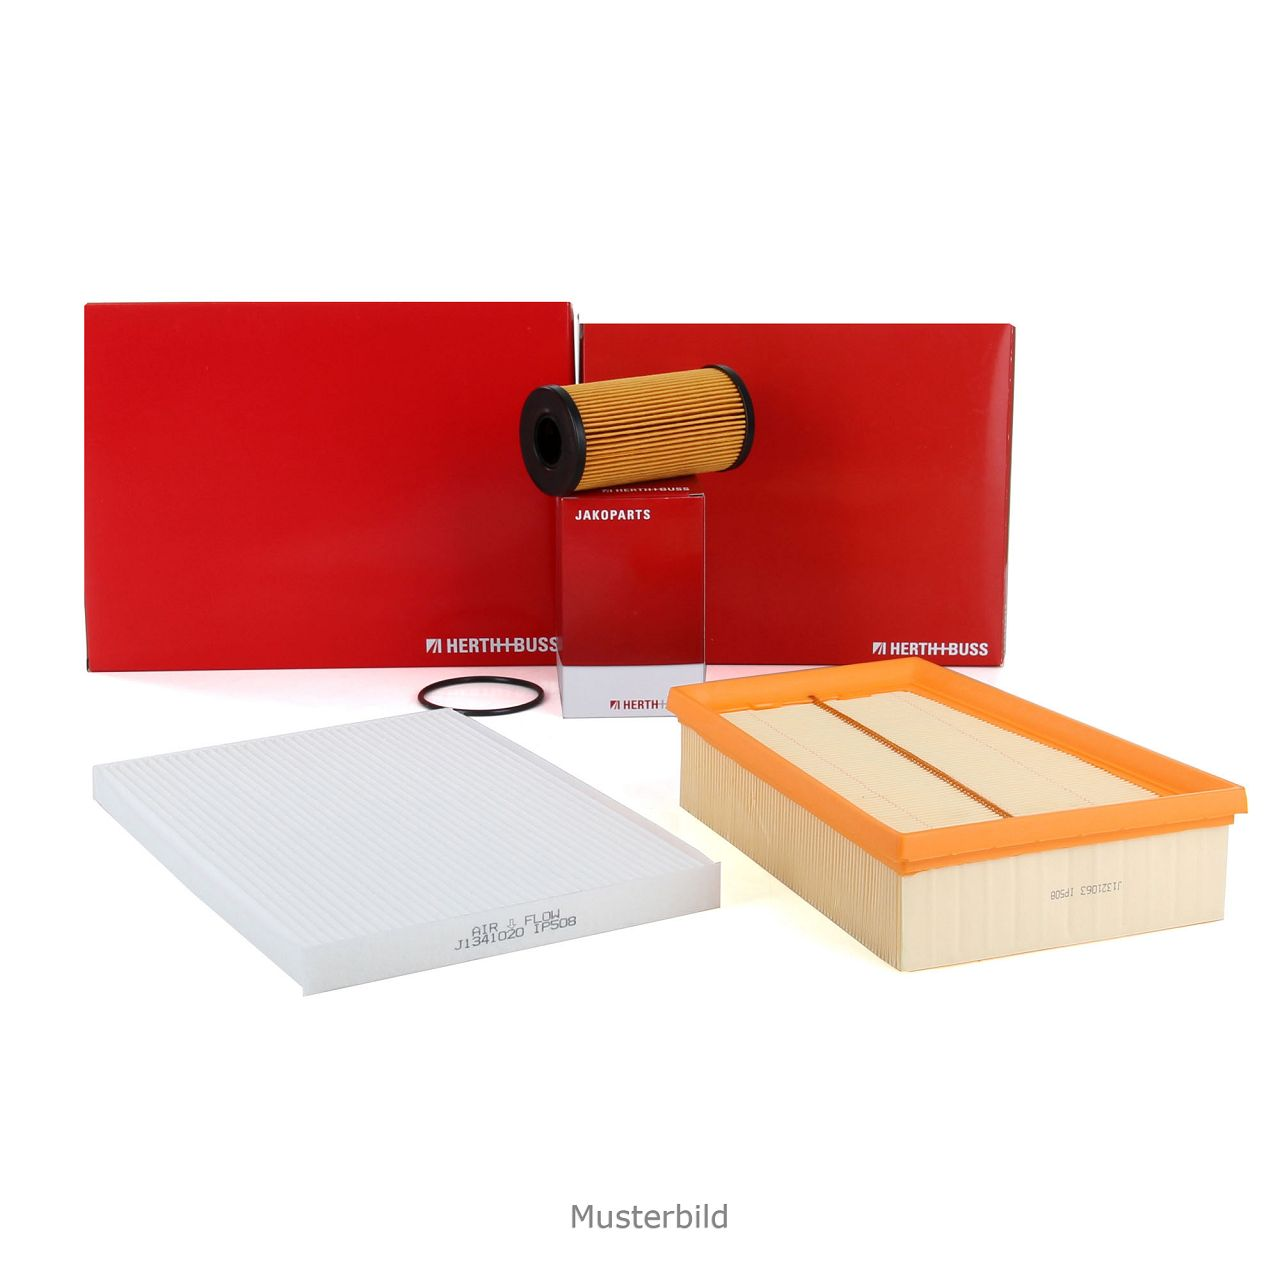 HERTH+BUSS JAKOPARTS Inspektionskit Filterpaket für TOYOTA IQ 1.4 D-4D 90 PS